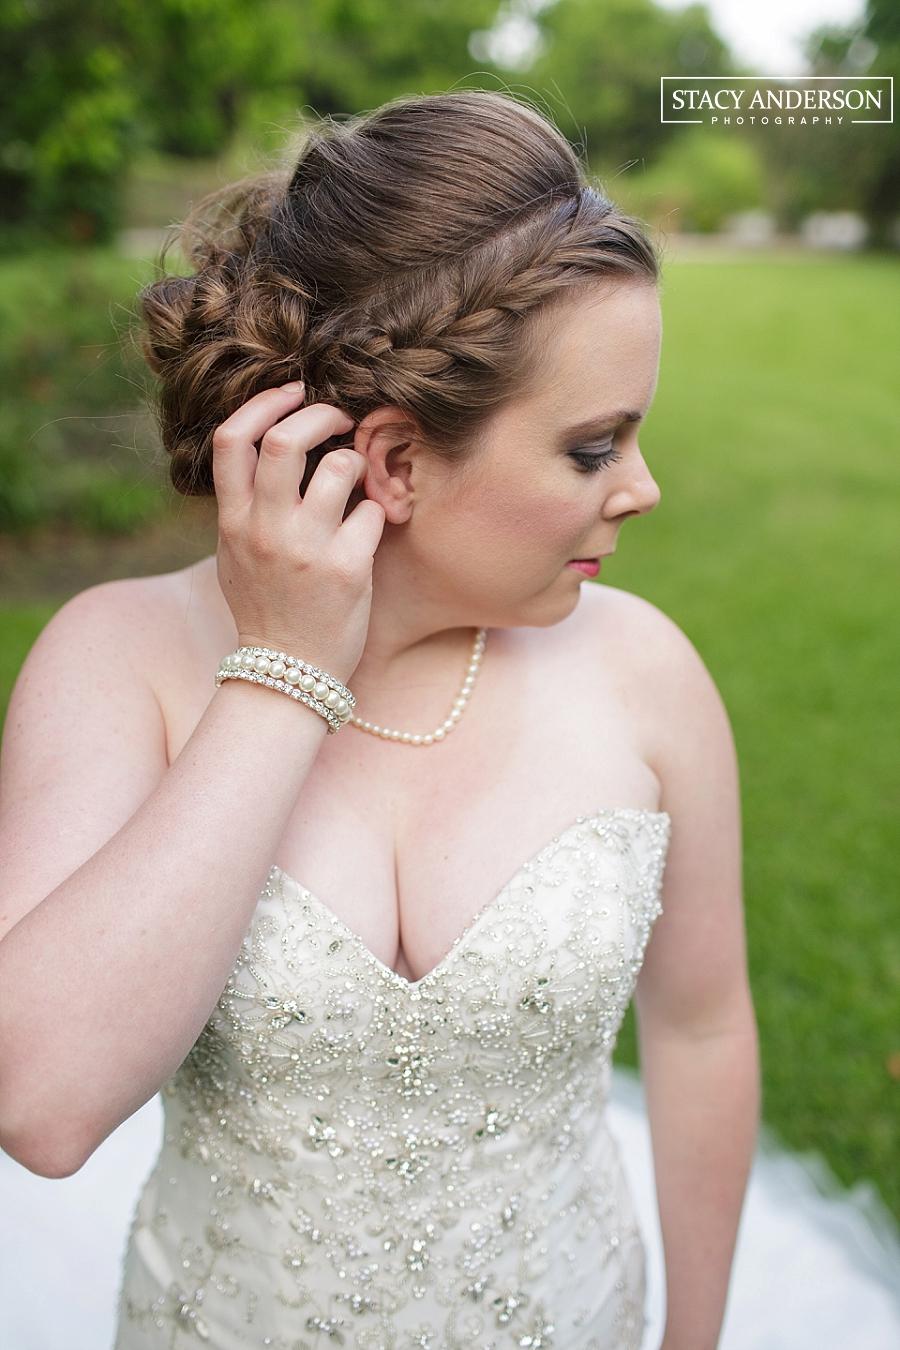 Stacy Anderson Photography Heaven on Earth Wedding Photographer_1697